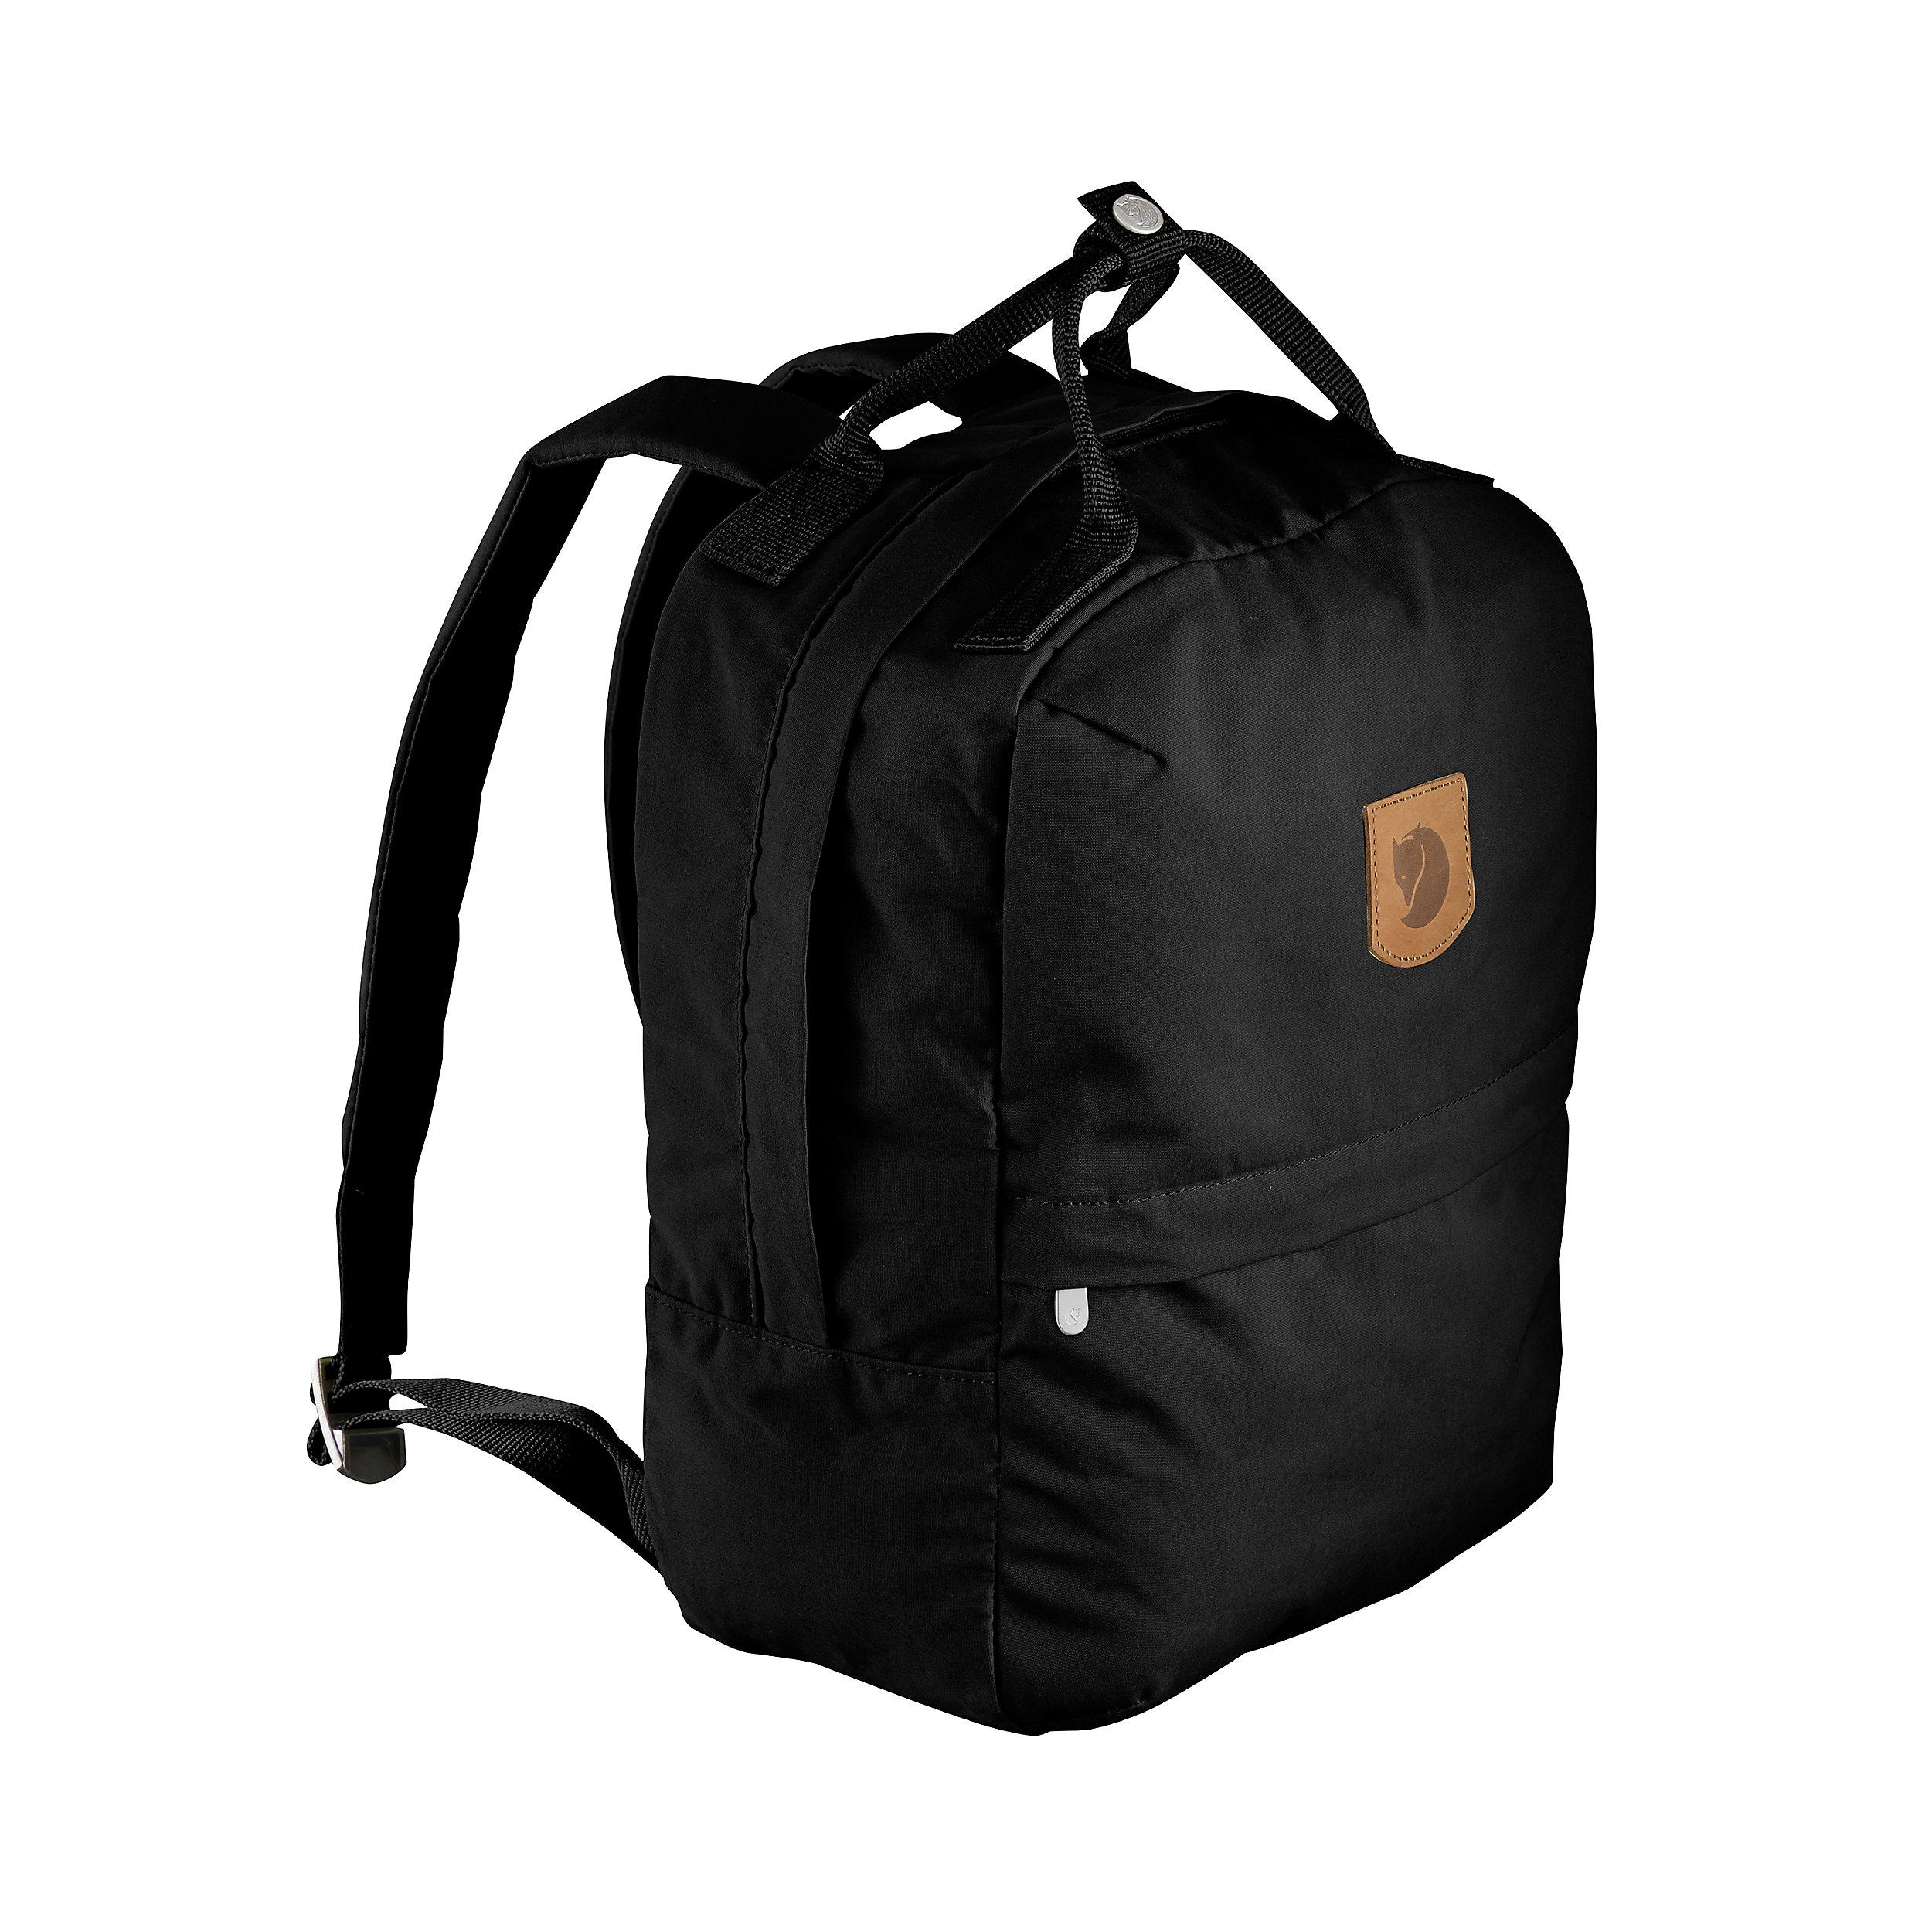 "Leisure Backpack Greenland Zip 13"" 16 Liter"